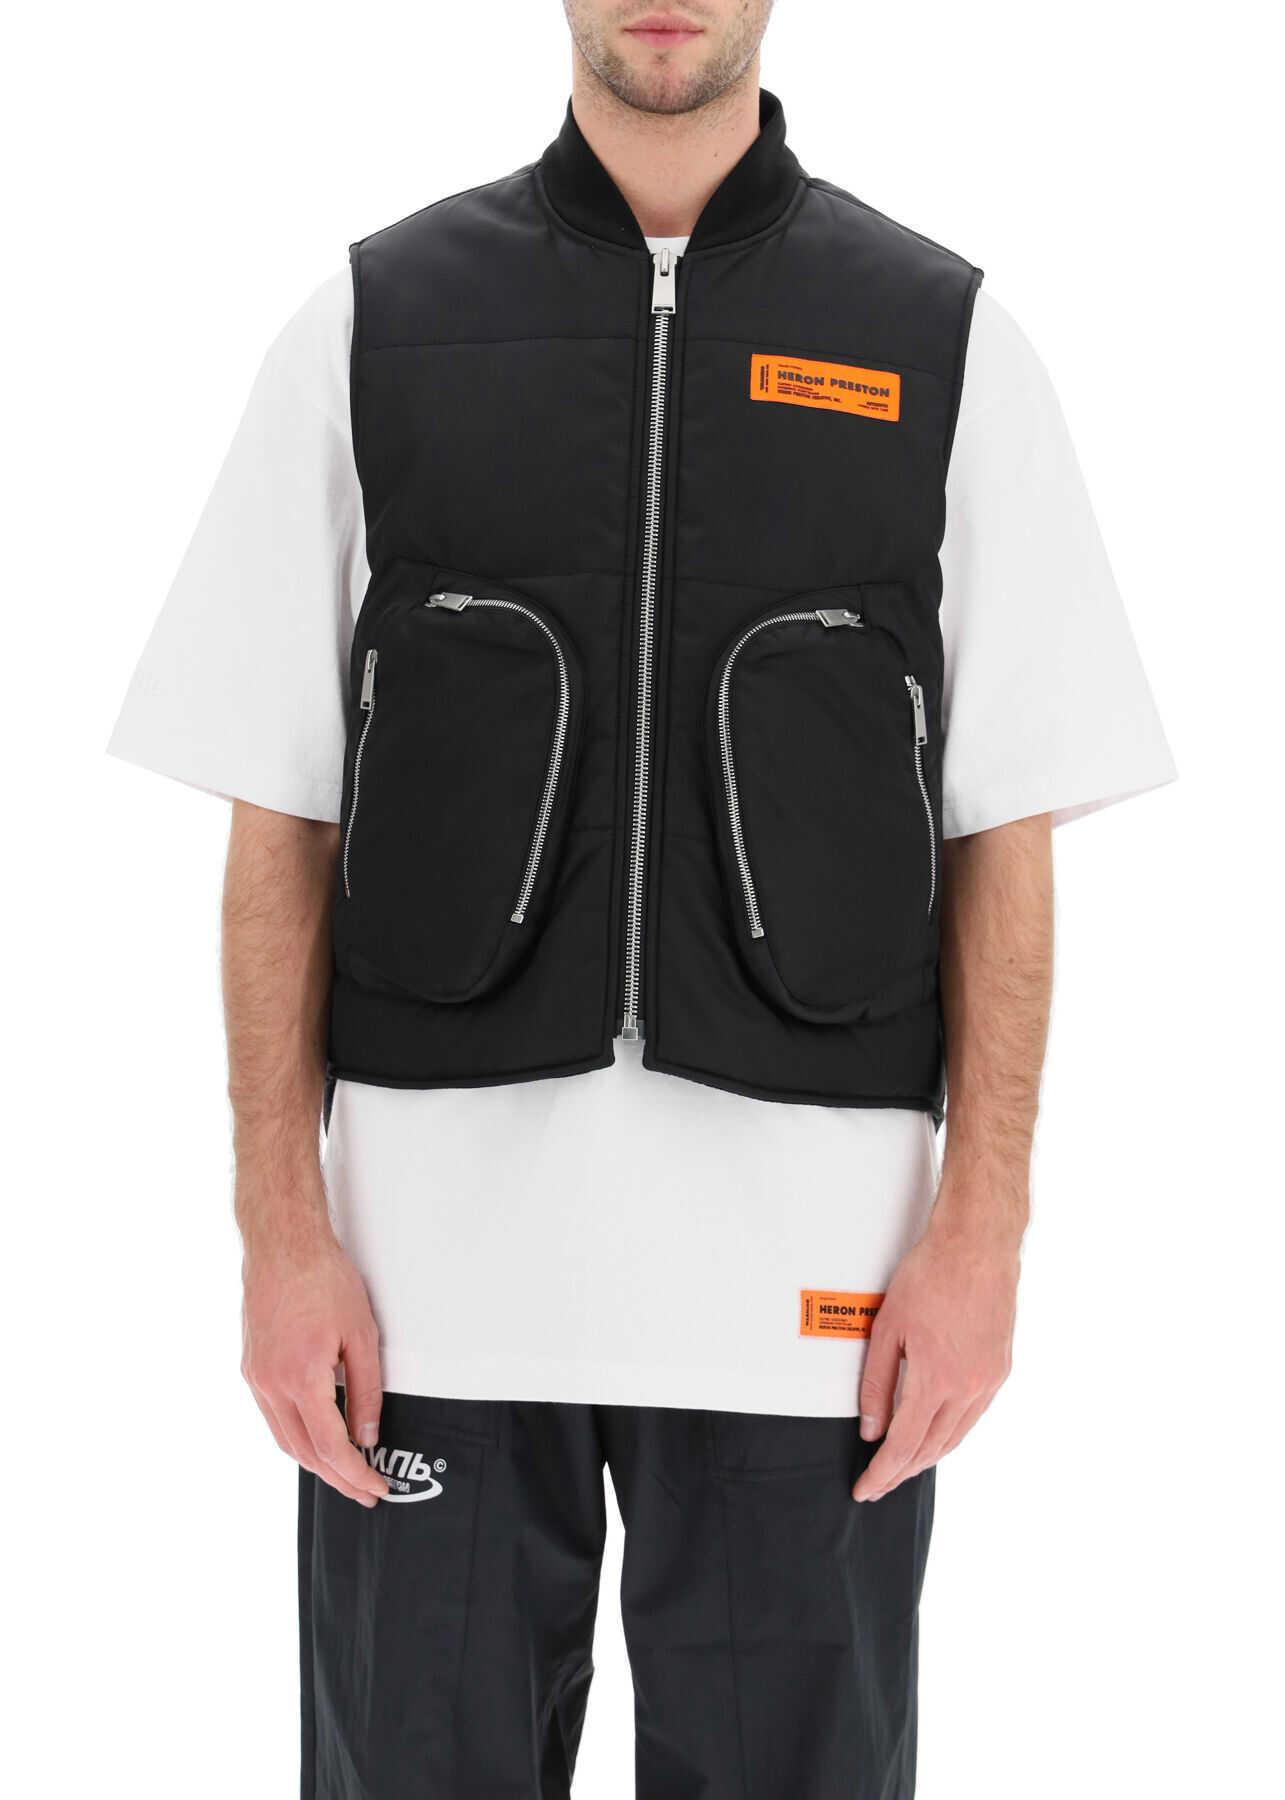 Heron Preston Padded Vest With Pockets BLACK imagine